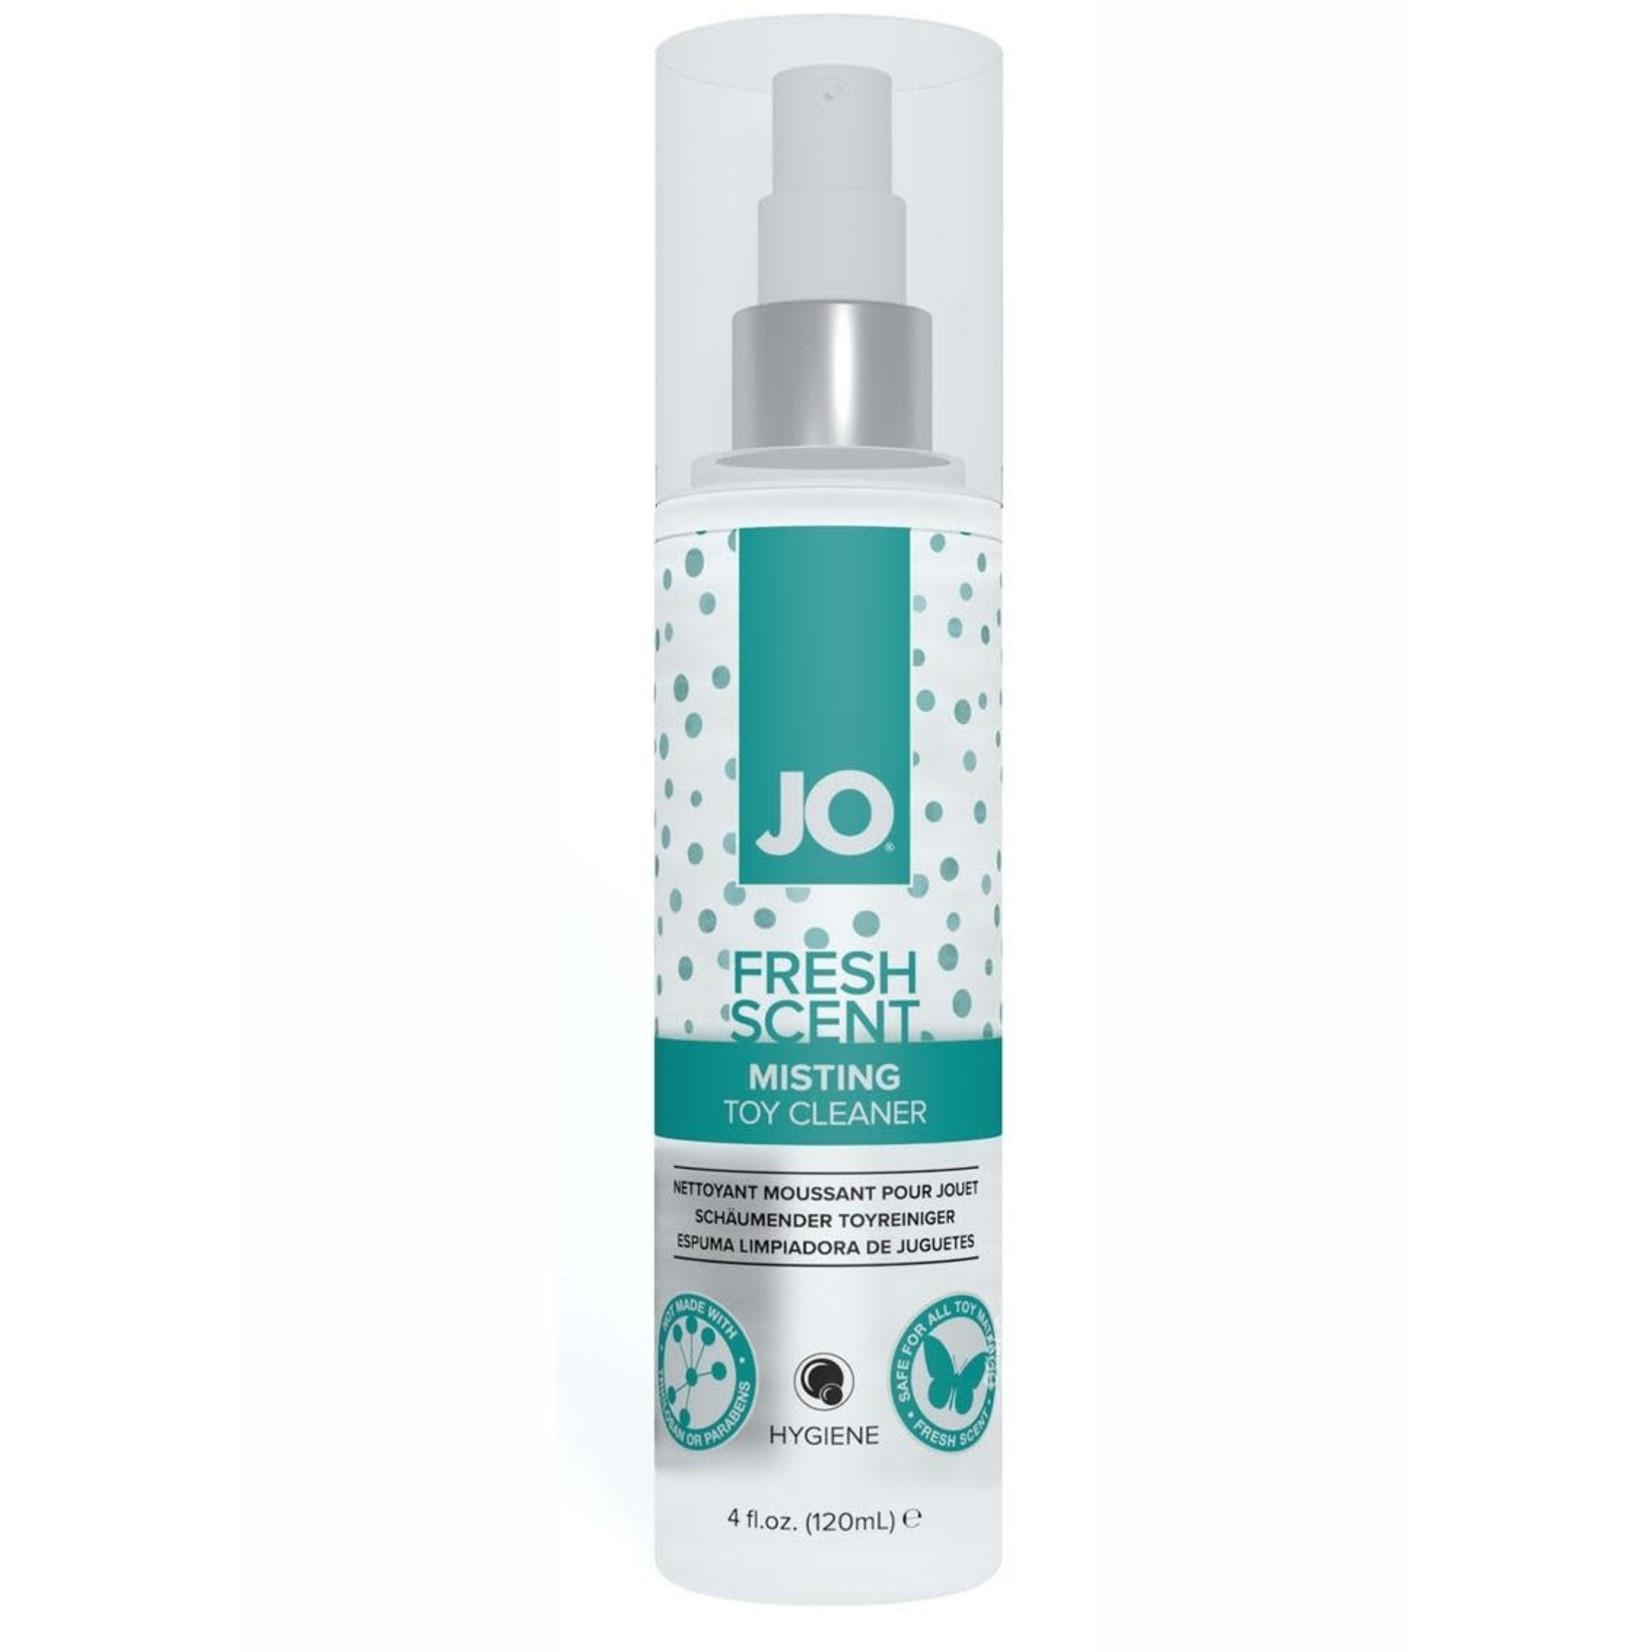 JO Misting Toy Cleaner Fresh Scent 4oz